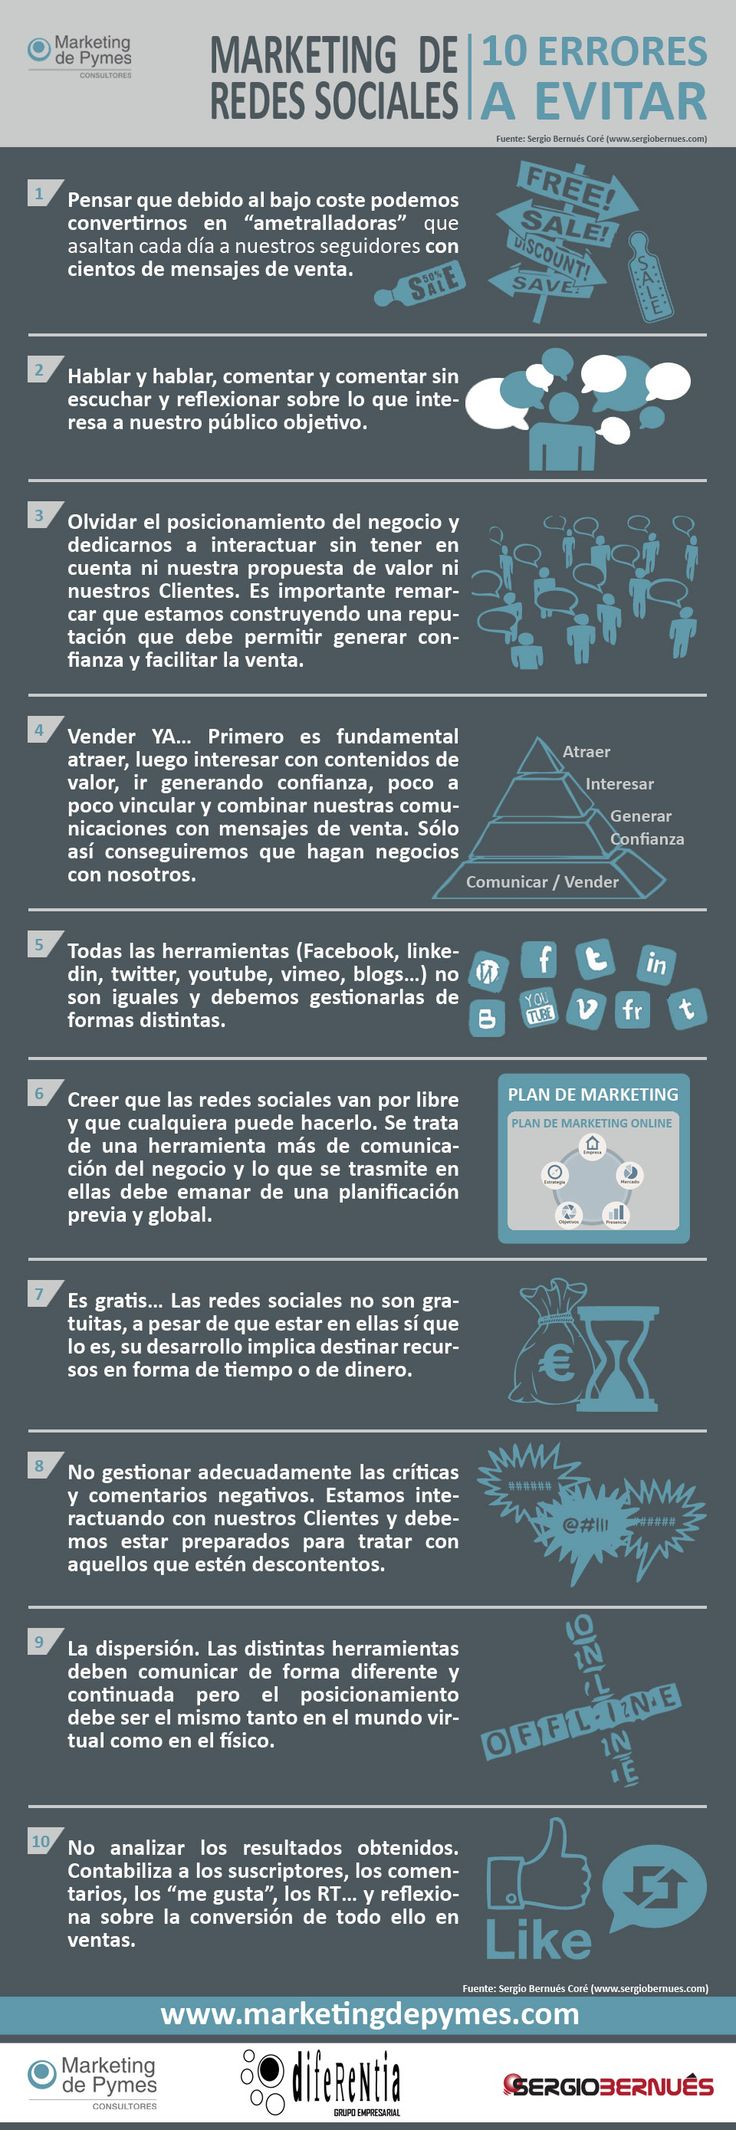 10 errores en marketing en Redes Sociales #infografia